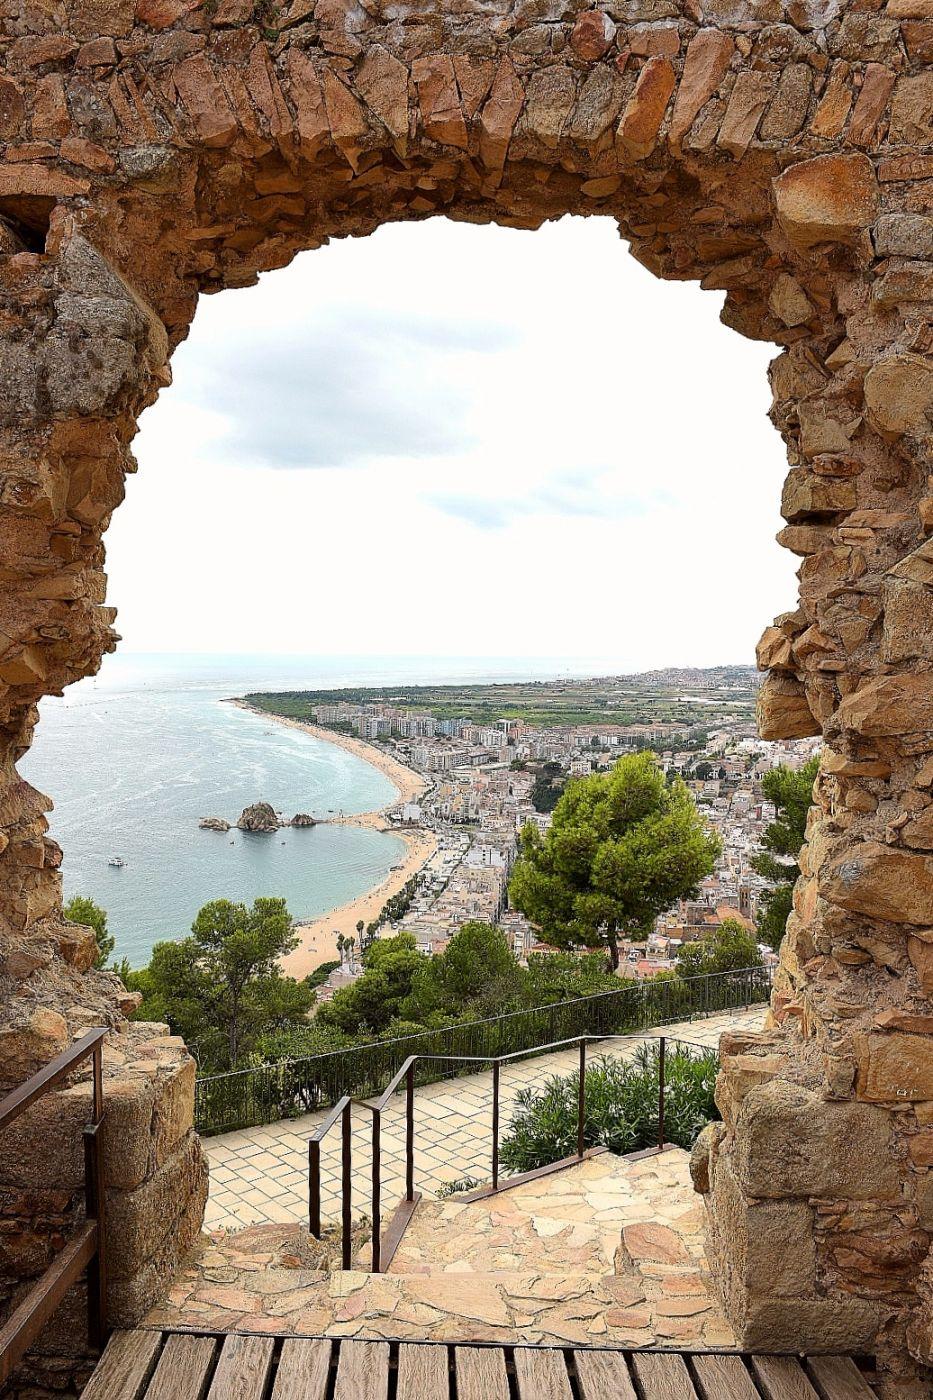 Portal to Costa Brava, Spain